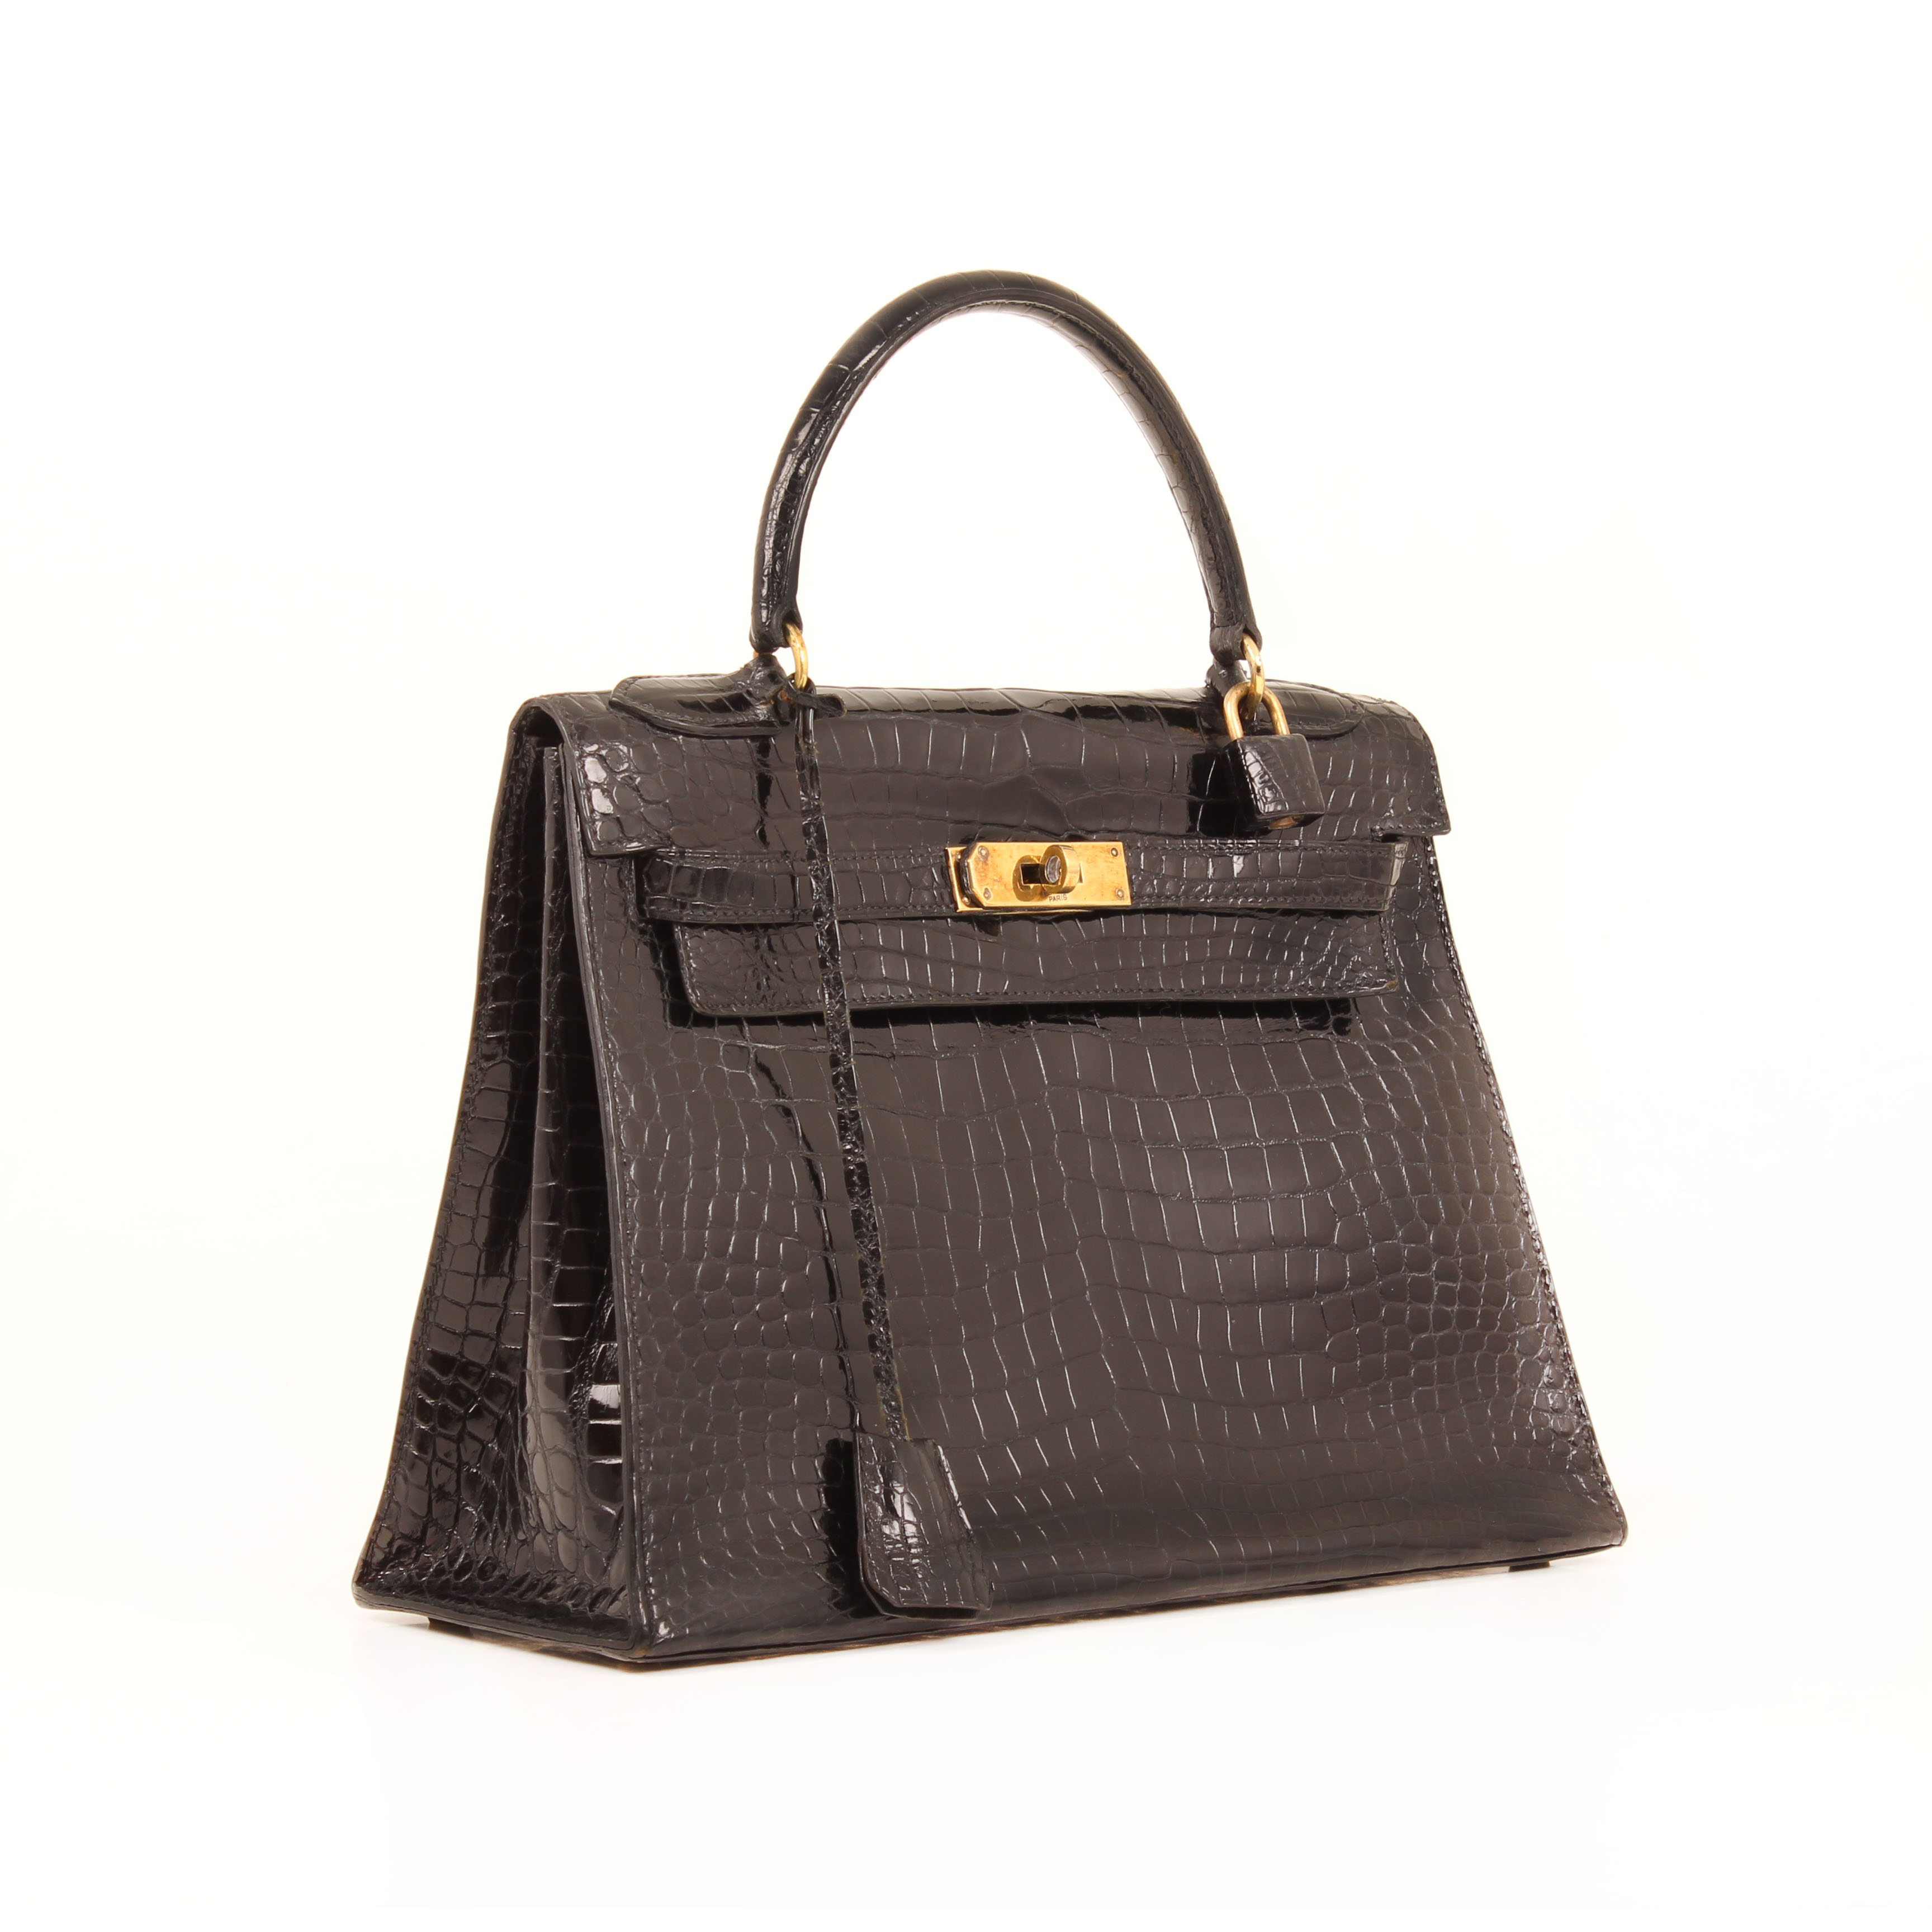 6e81a57e59b8 Hermès Bag Kelly 28 Sellier Croco Vintage. handbag hermes kelly 32 gold  sellier leather ...